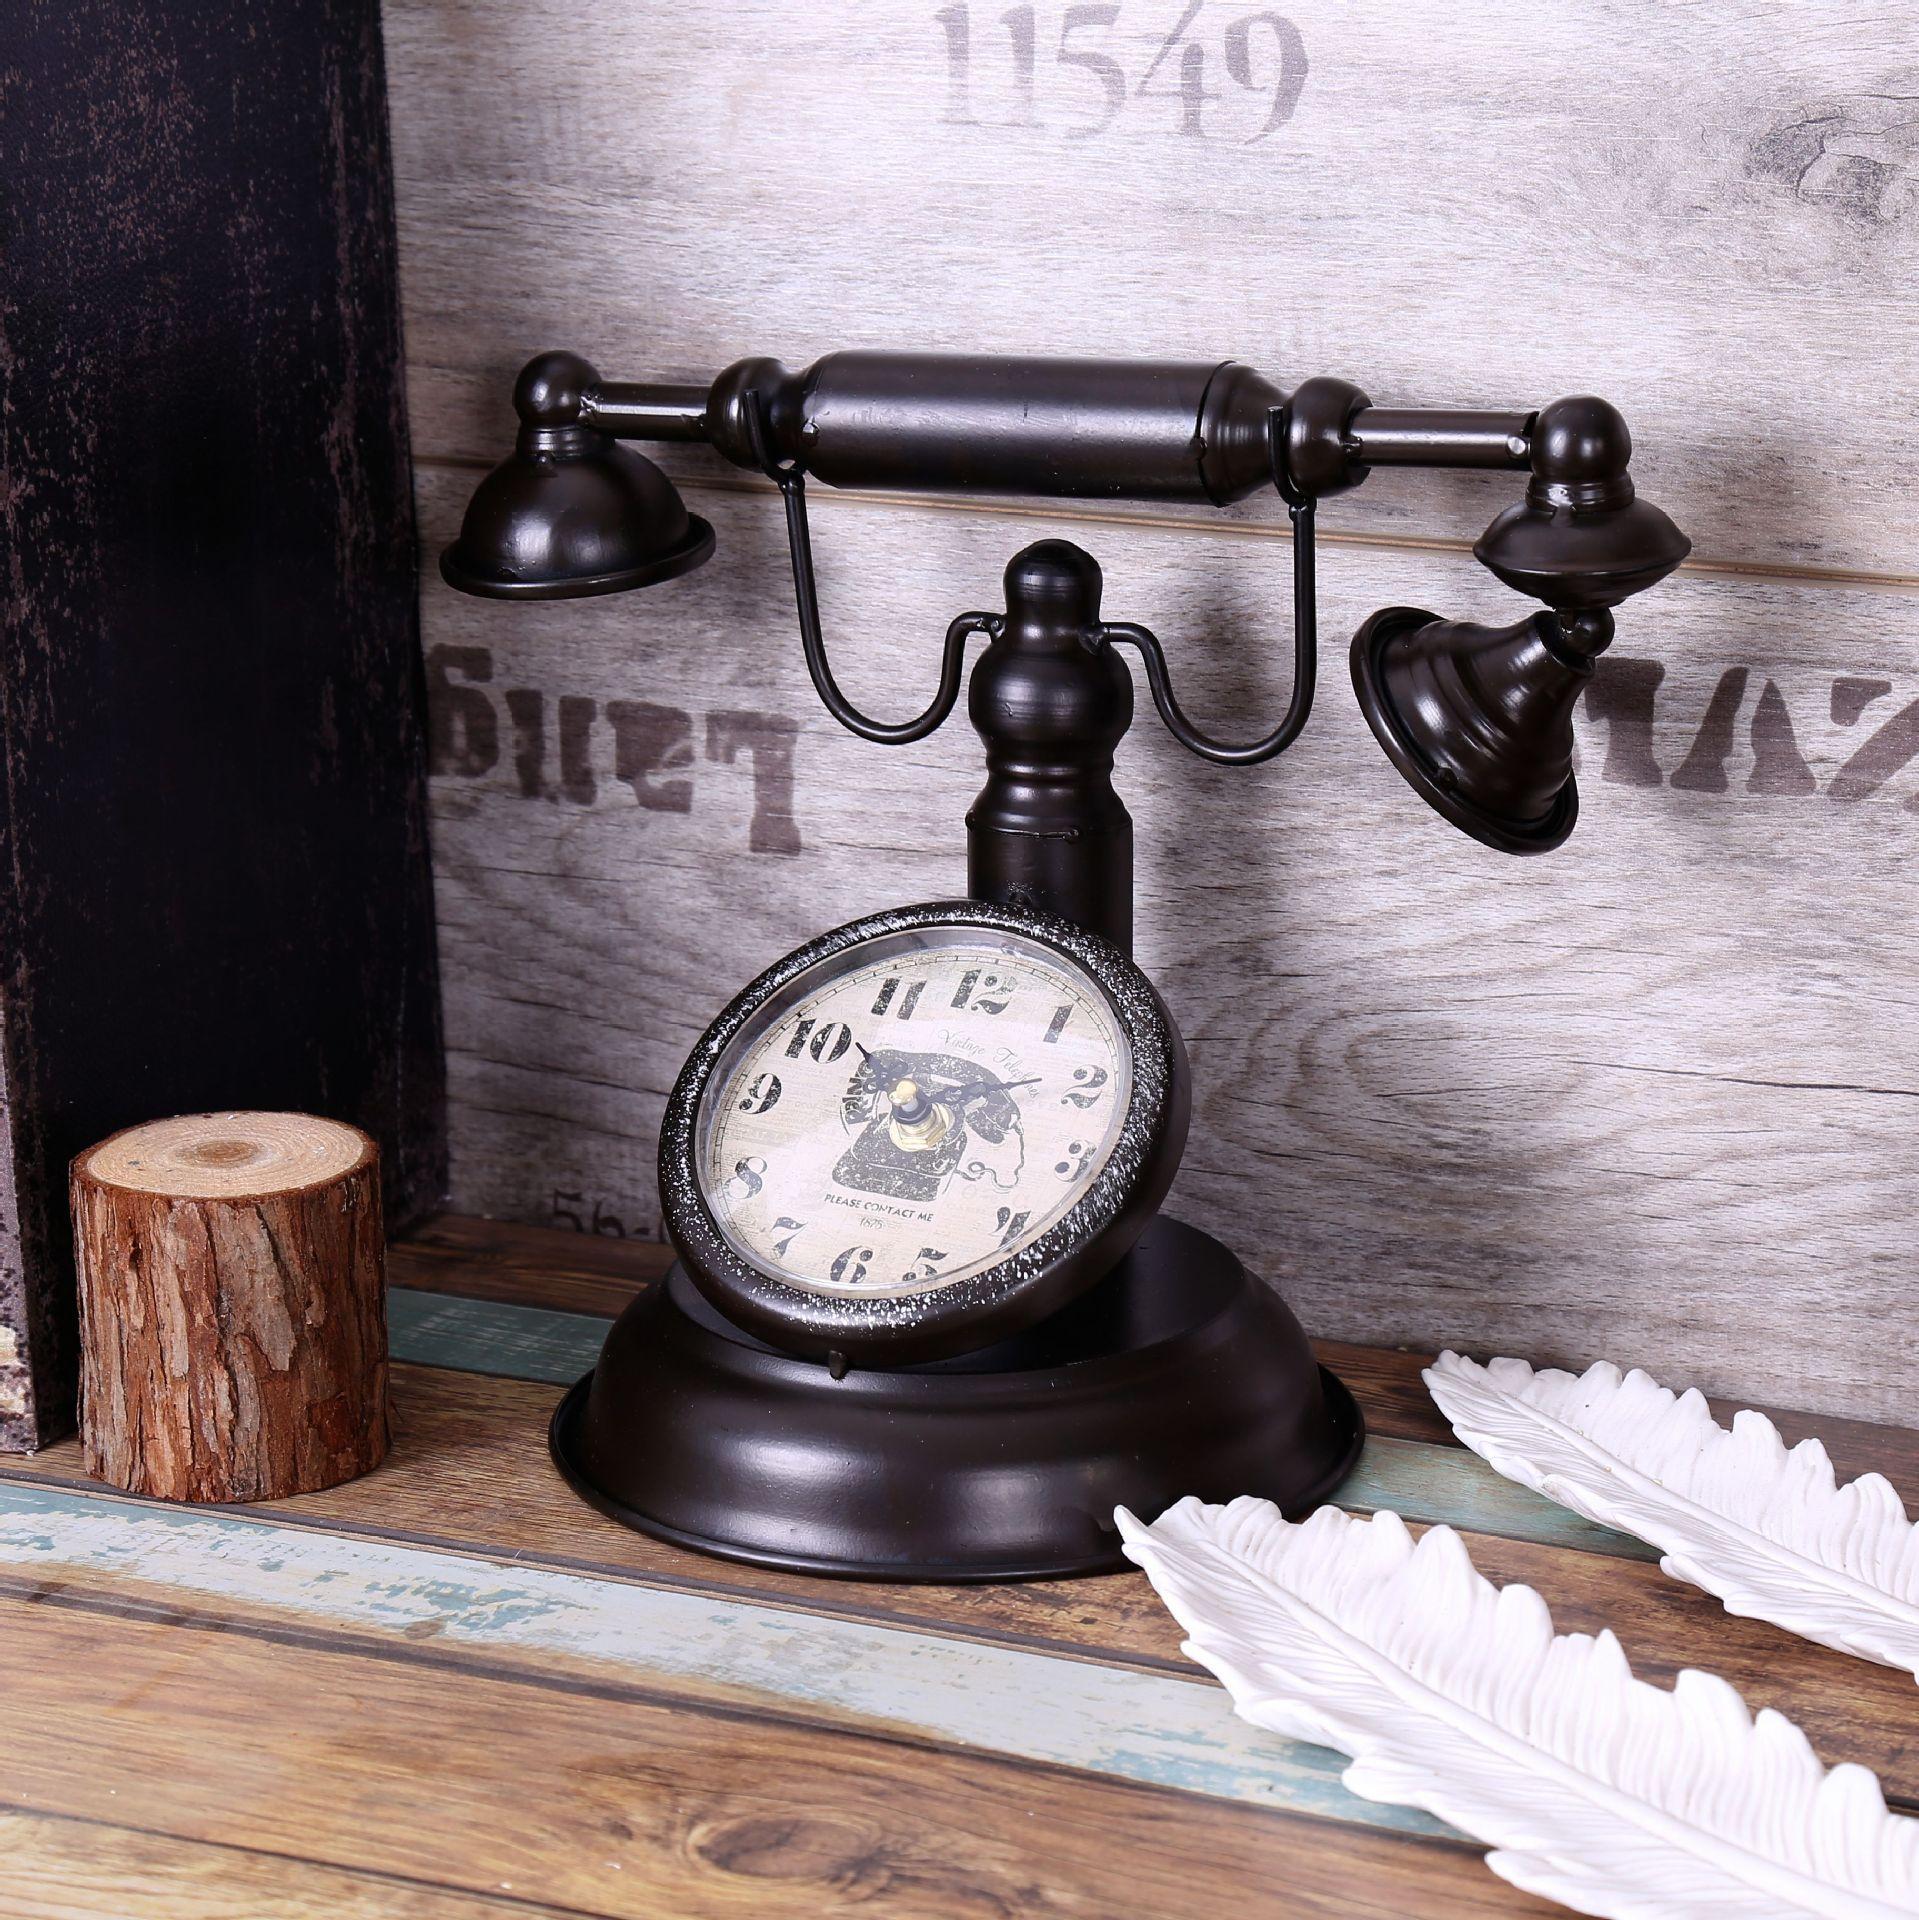 Shabby Chic Retro Telephone Model Vintage Decor Retro Desk Clock Table Clock Bar Cafe Crafts Decoration